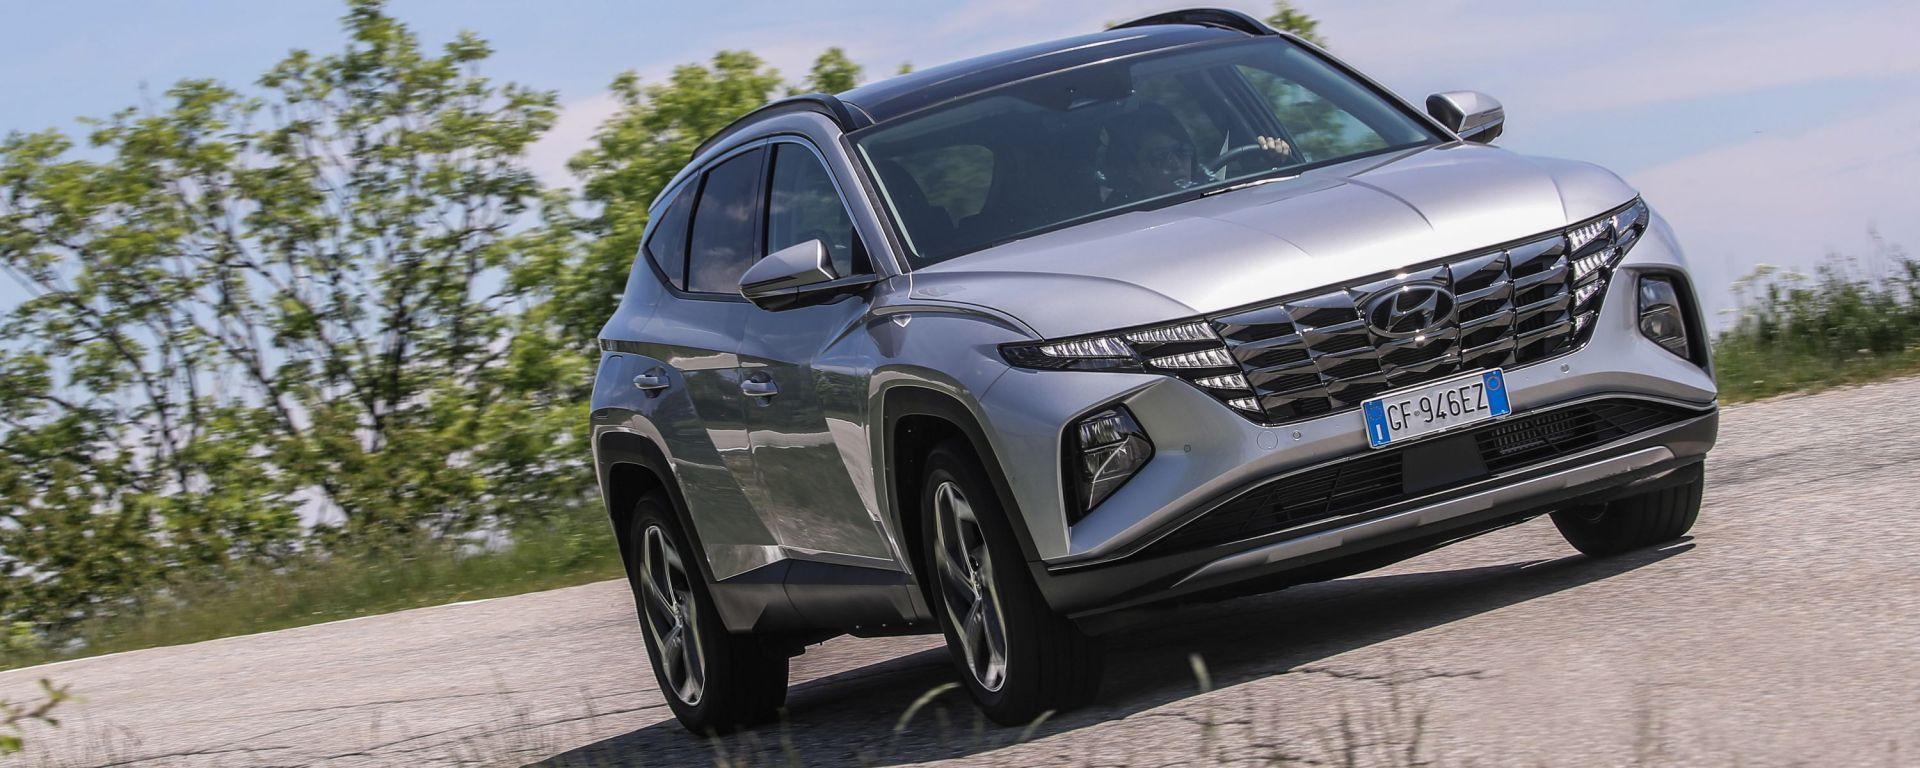 Hyundai Tucson Plug-in Hybrid: visuale di 3/4 anteriore